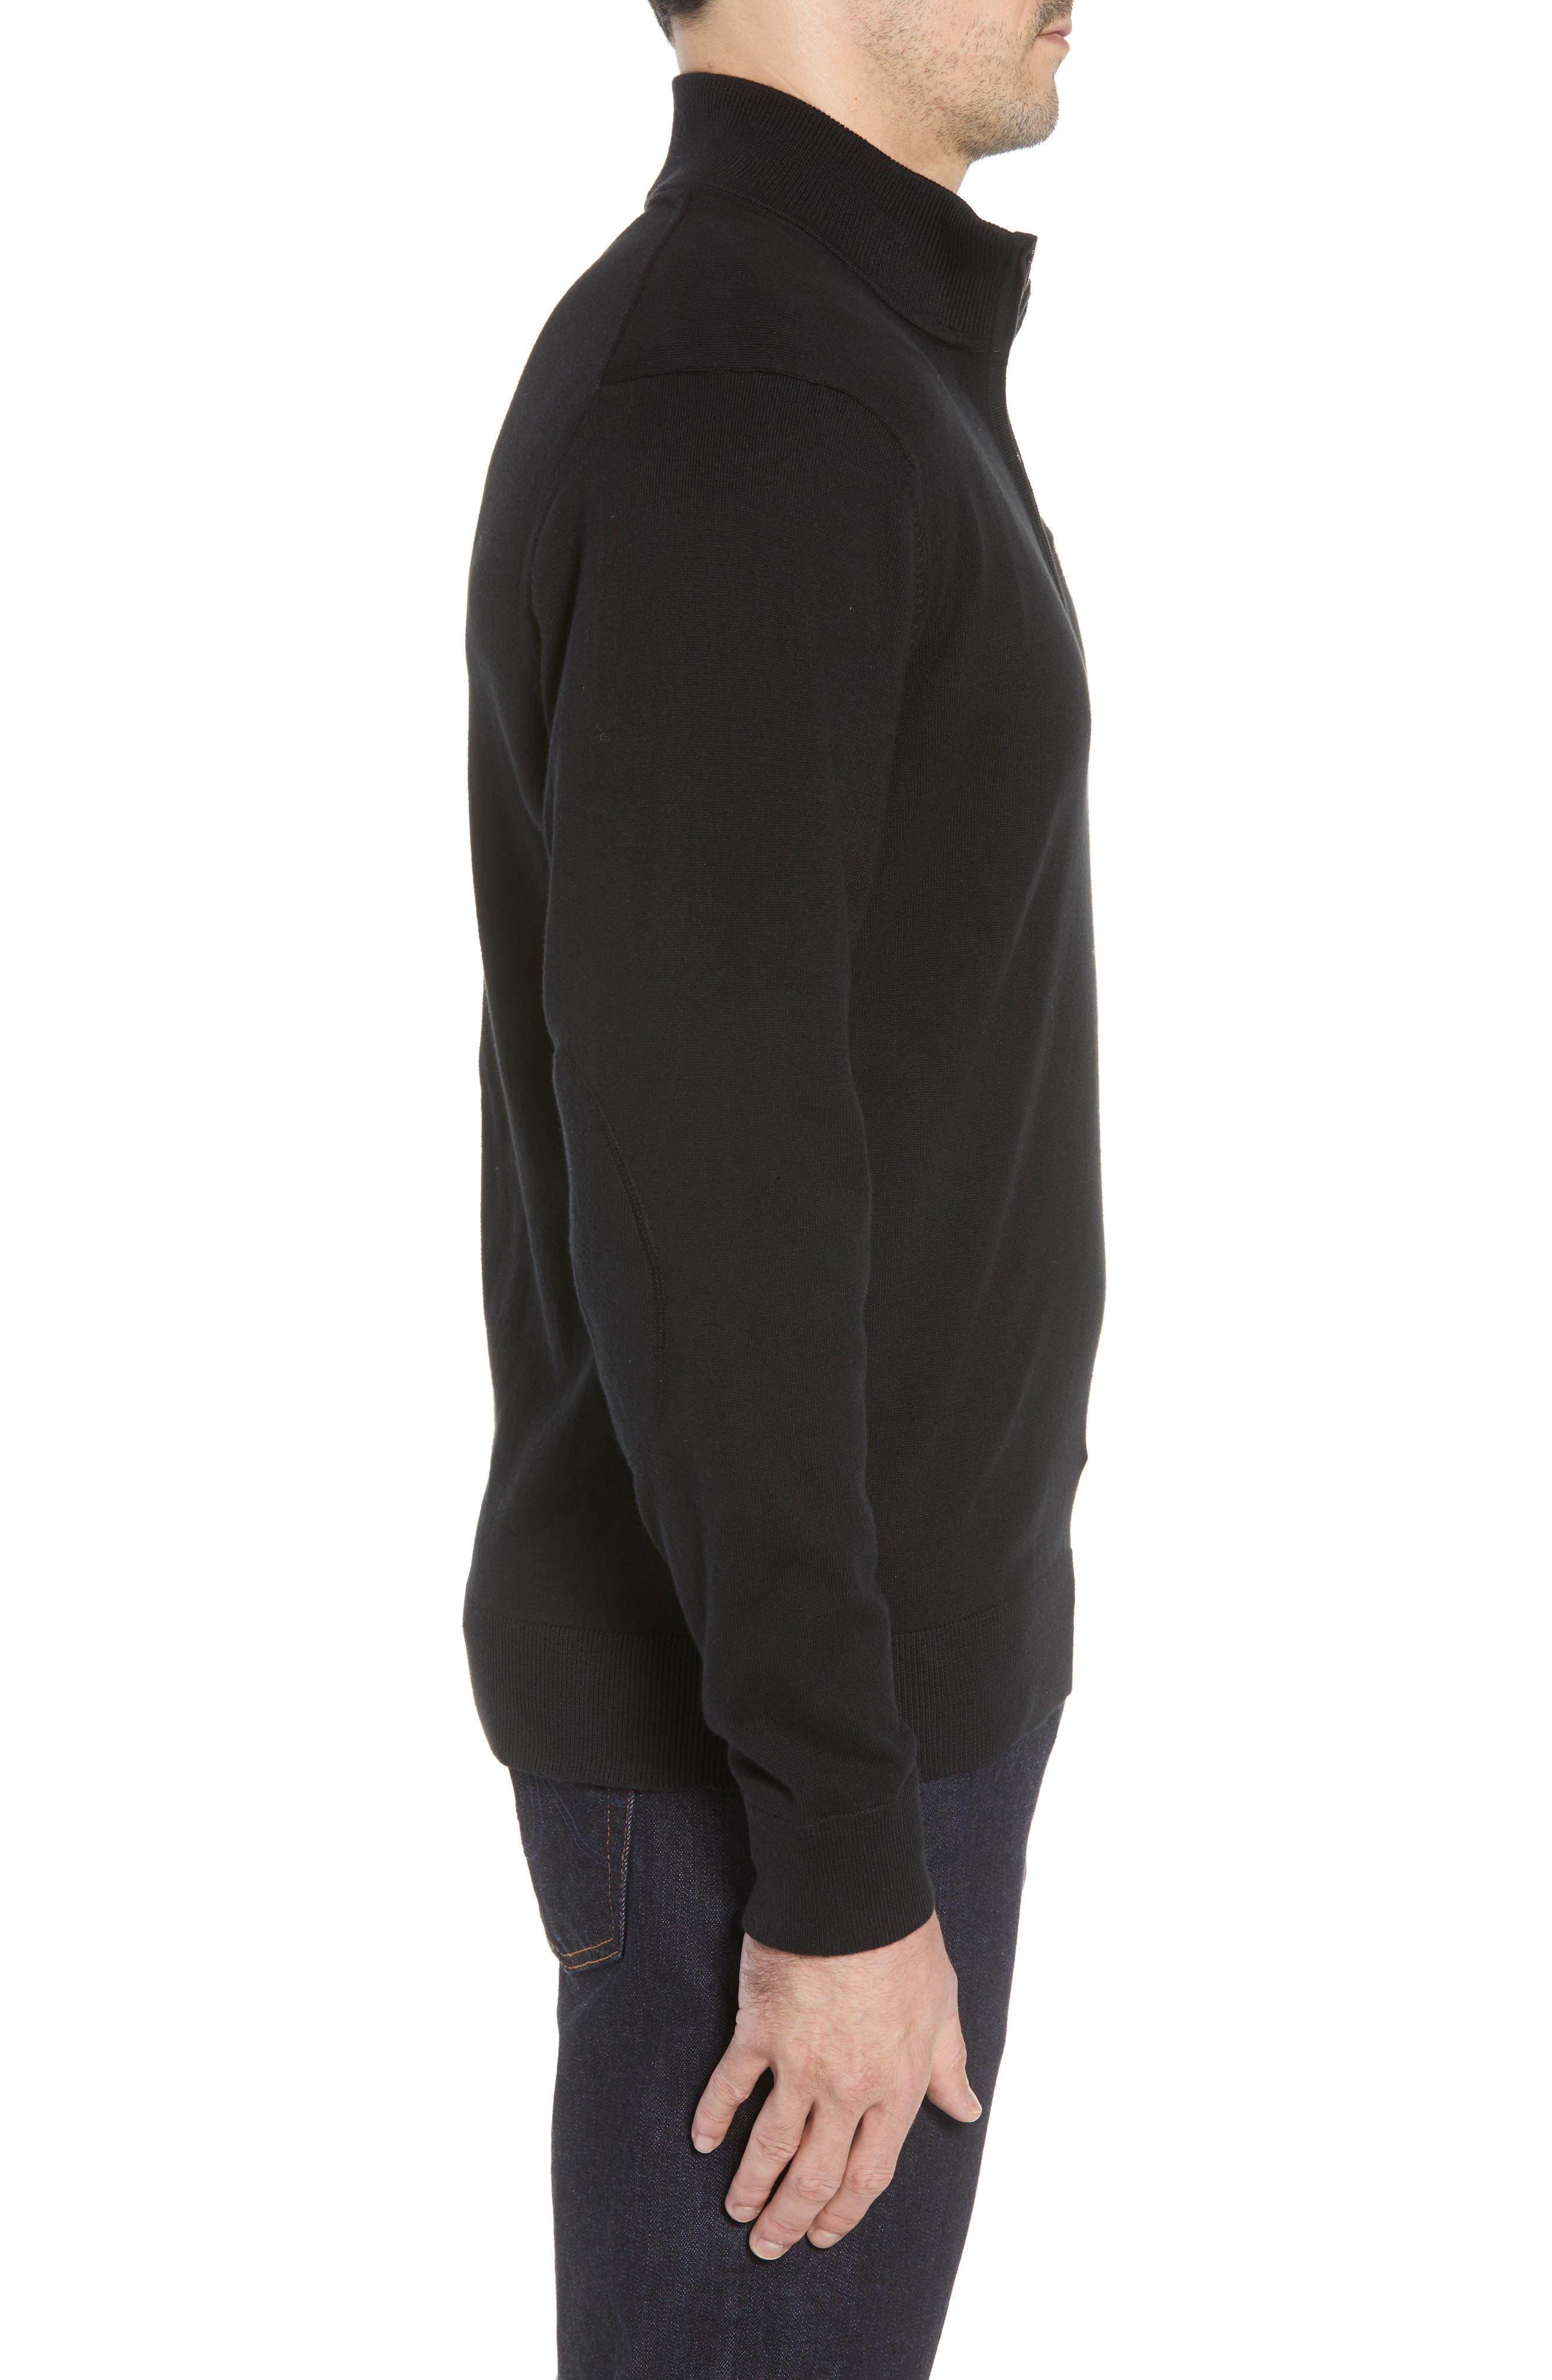 Jacksonville Jaguars - Lakemont Regular Fit Quarter Zip Sweater,                             Alternate thumbnail 3, color,                             BLACK